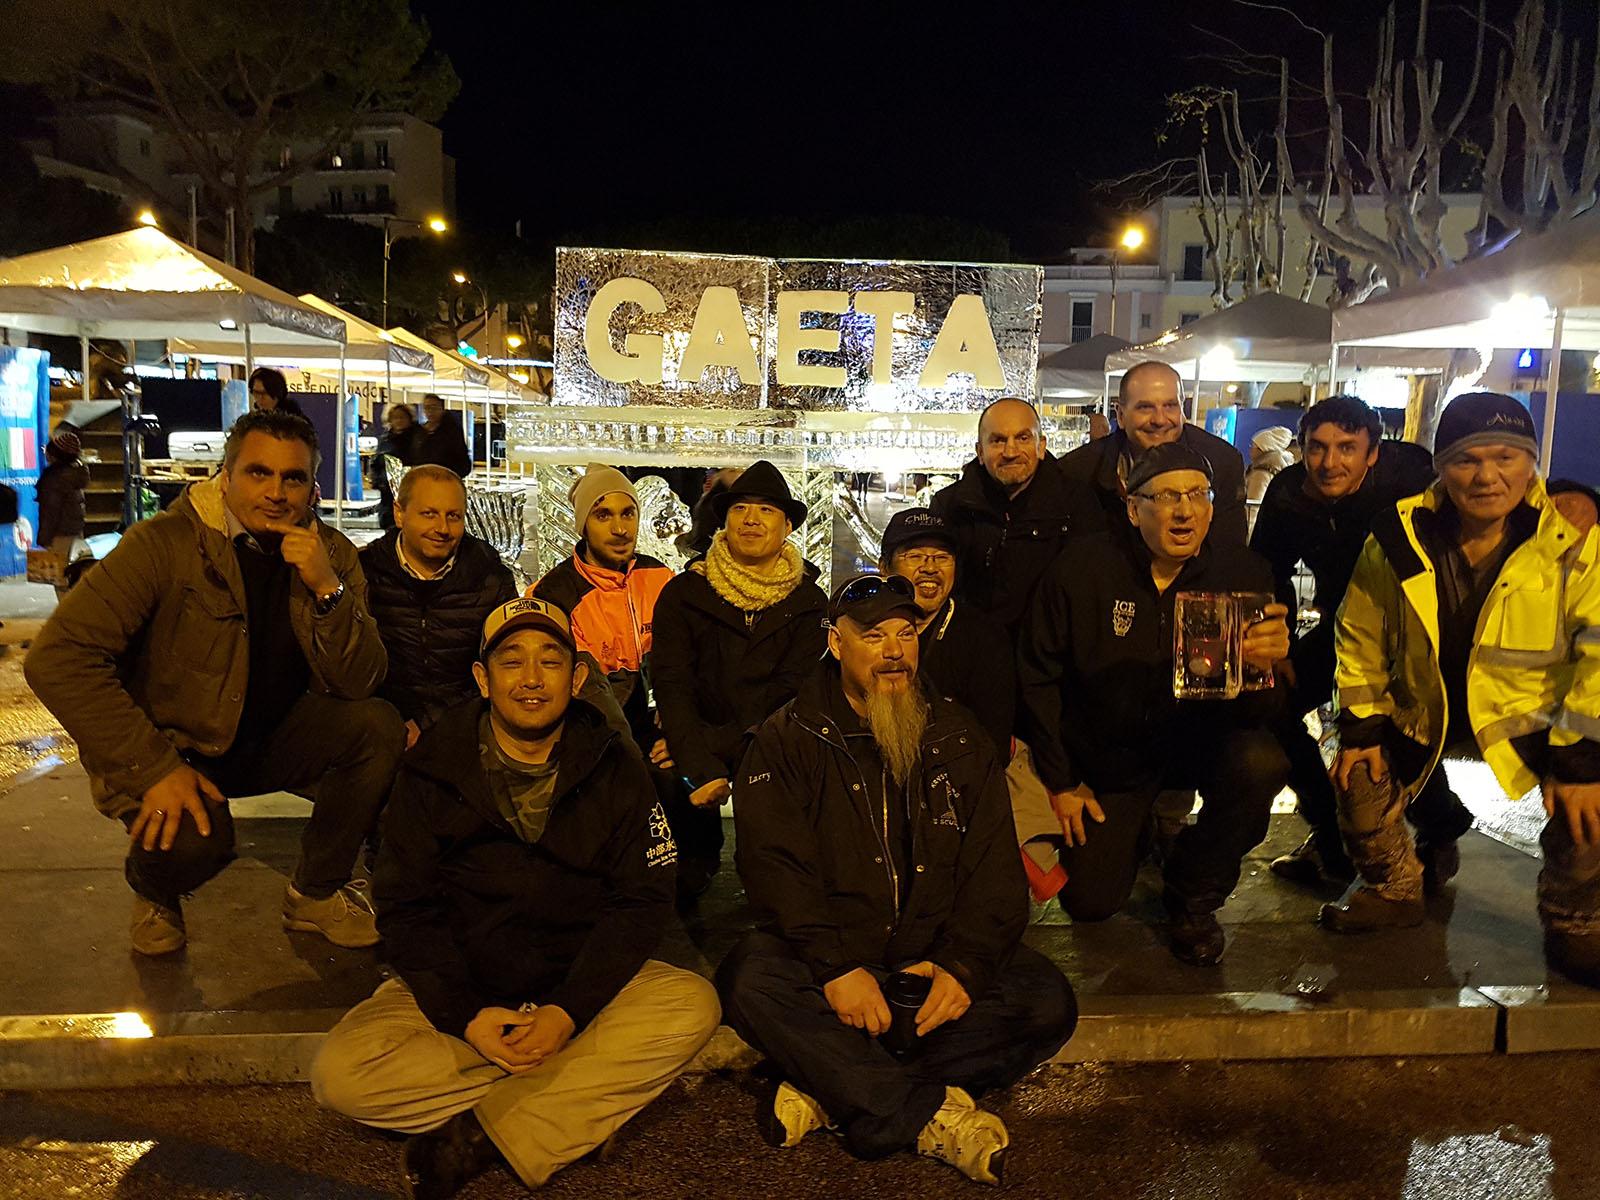 artisti in gara Gaeta 2018 2011 - Ghiaccio d'Arte